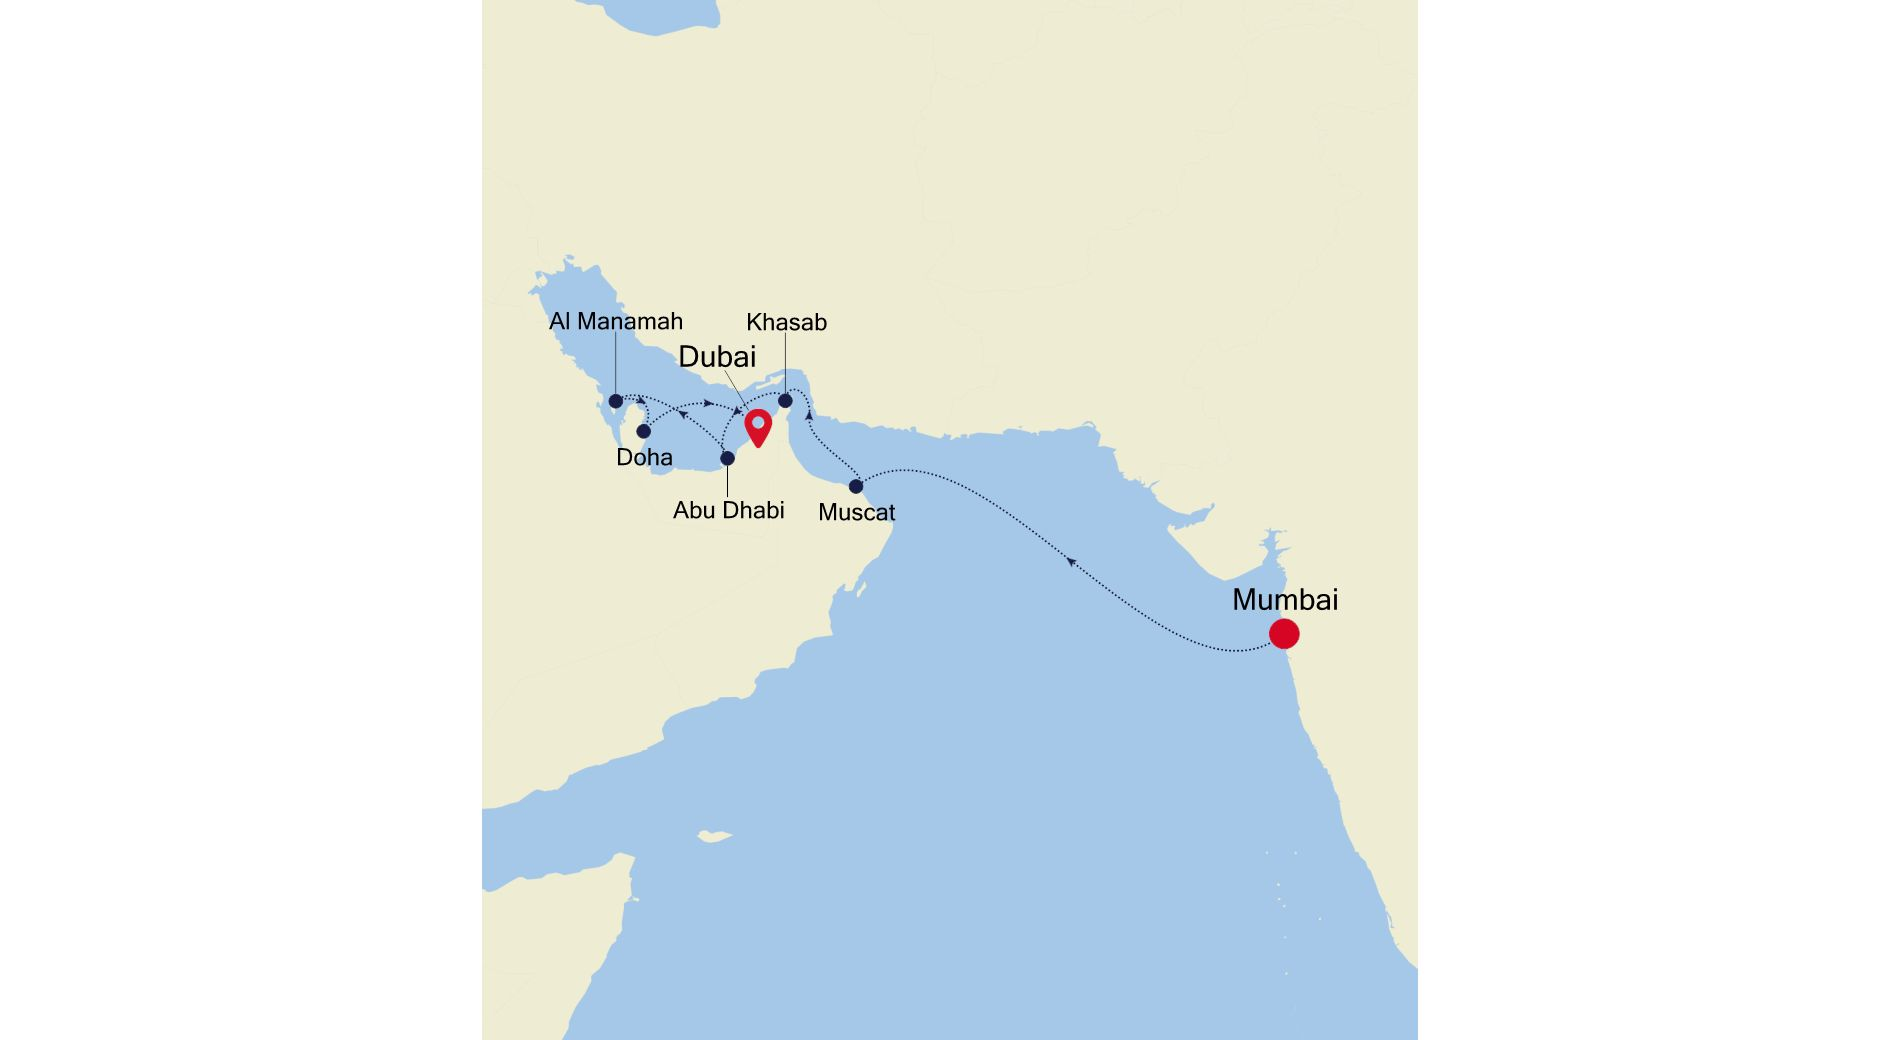 MO220304010 - Mumbai nach Dubai